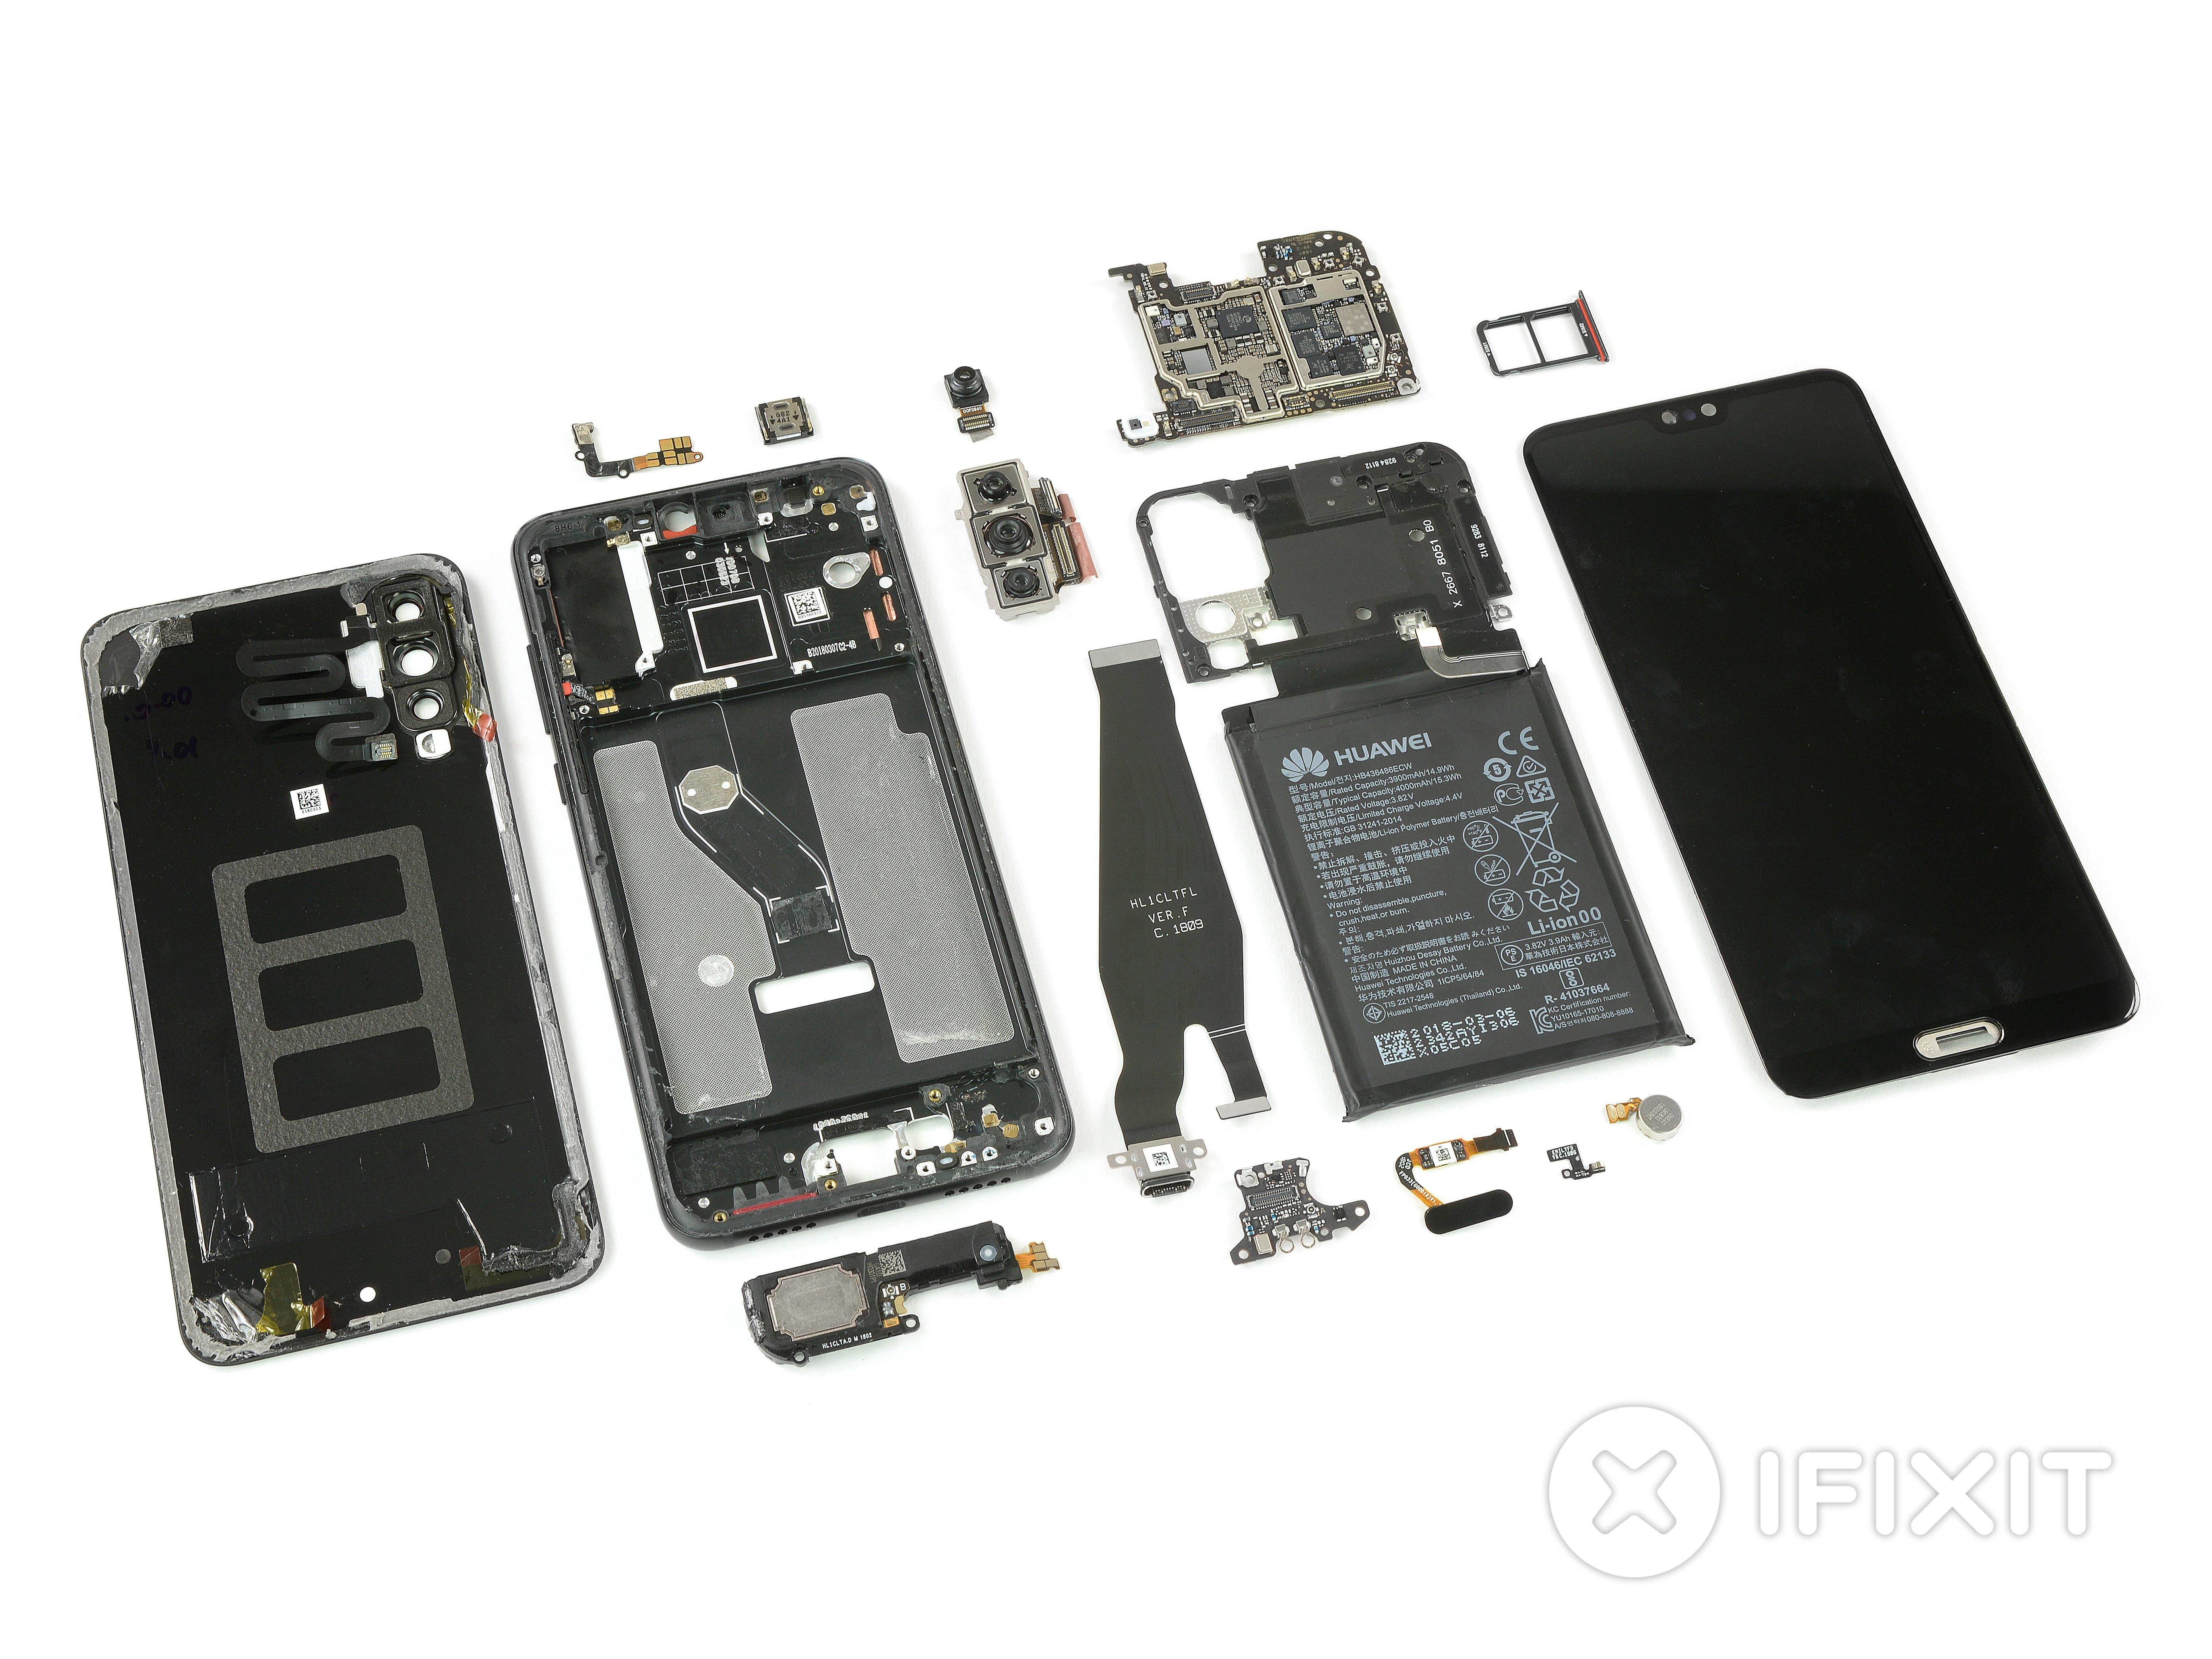 Huawei P20 Pro Teardown   iFixit